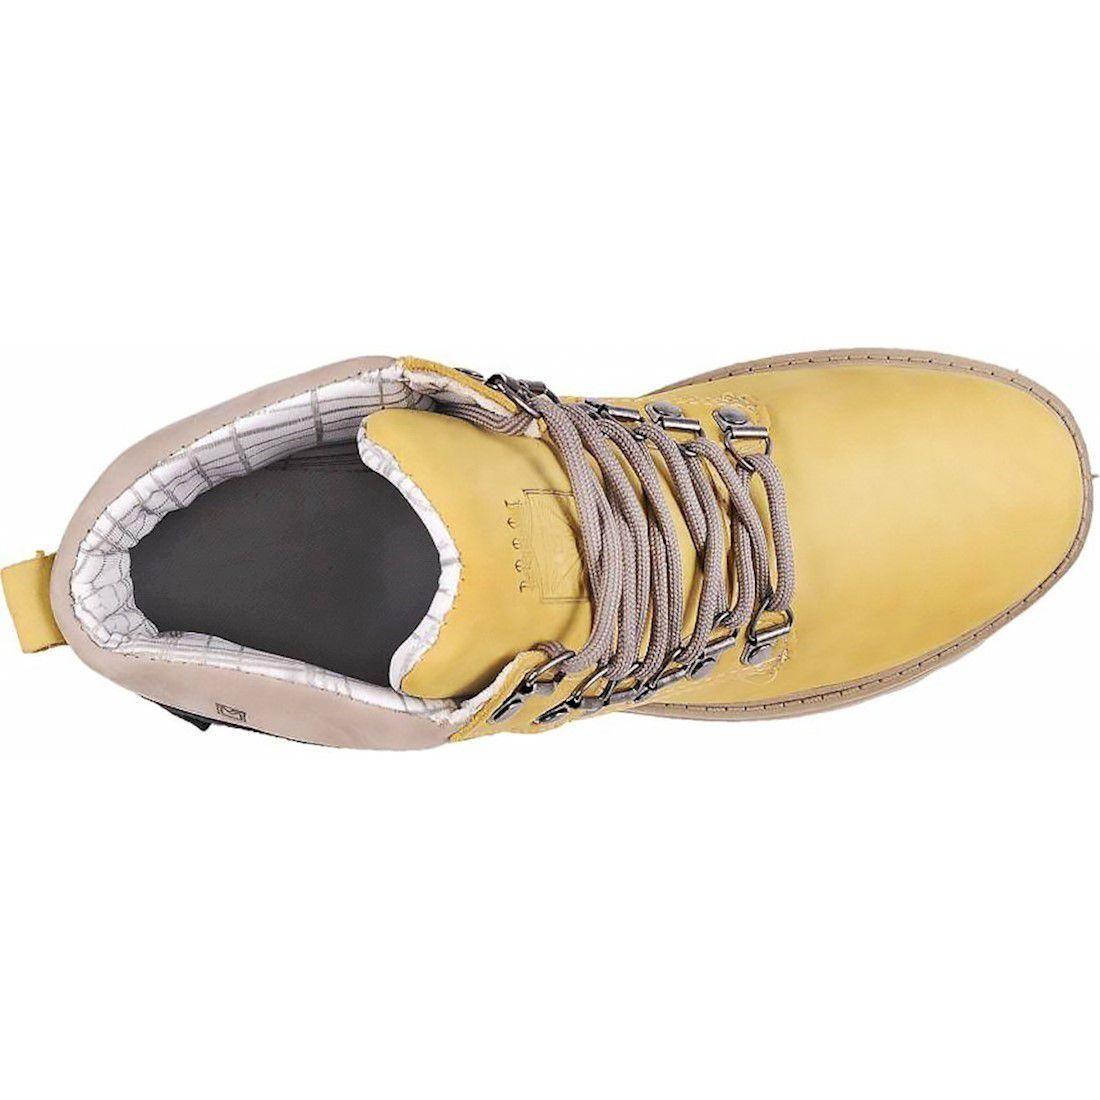 c14426ffd Bota work masculina sandro moscoloni worker amarela yellow - Sandro  republic R$ 149,90 à vista. Adicionar à sacola